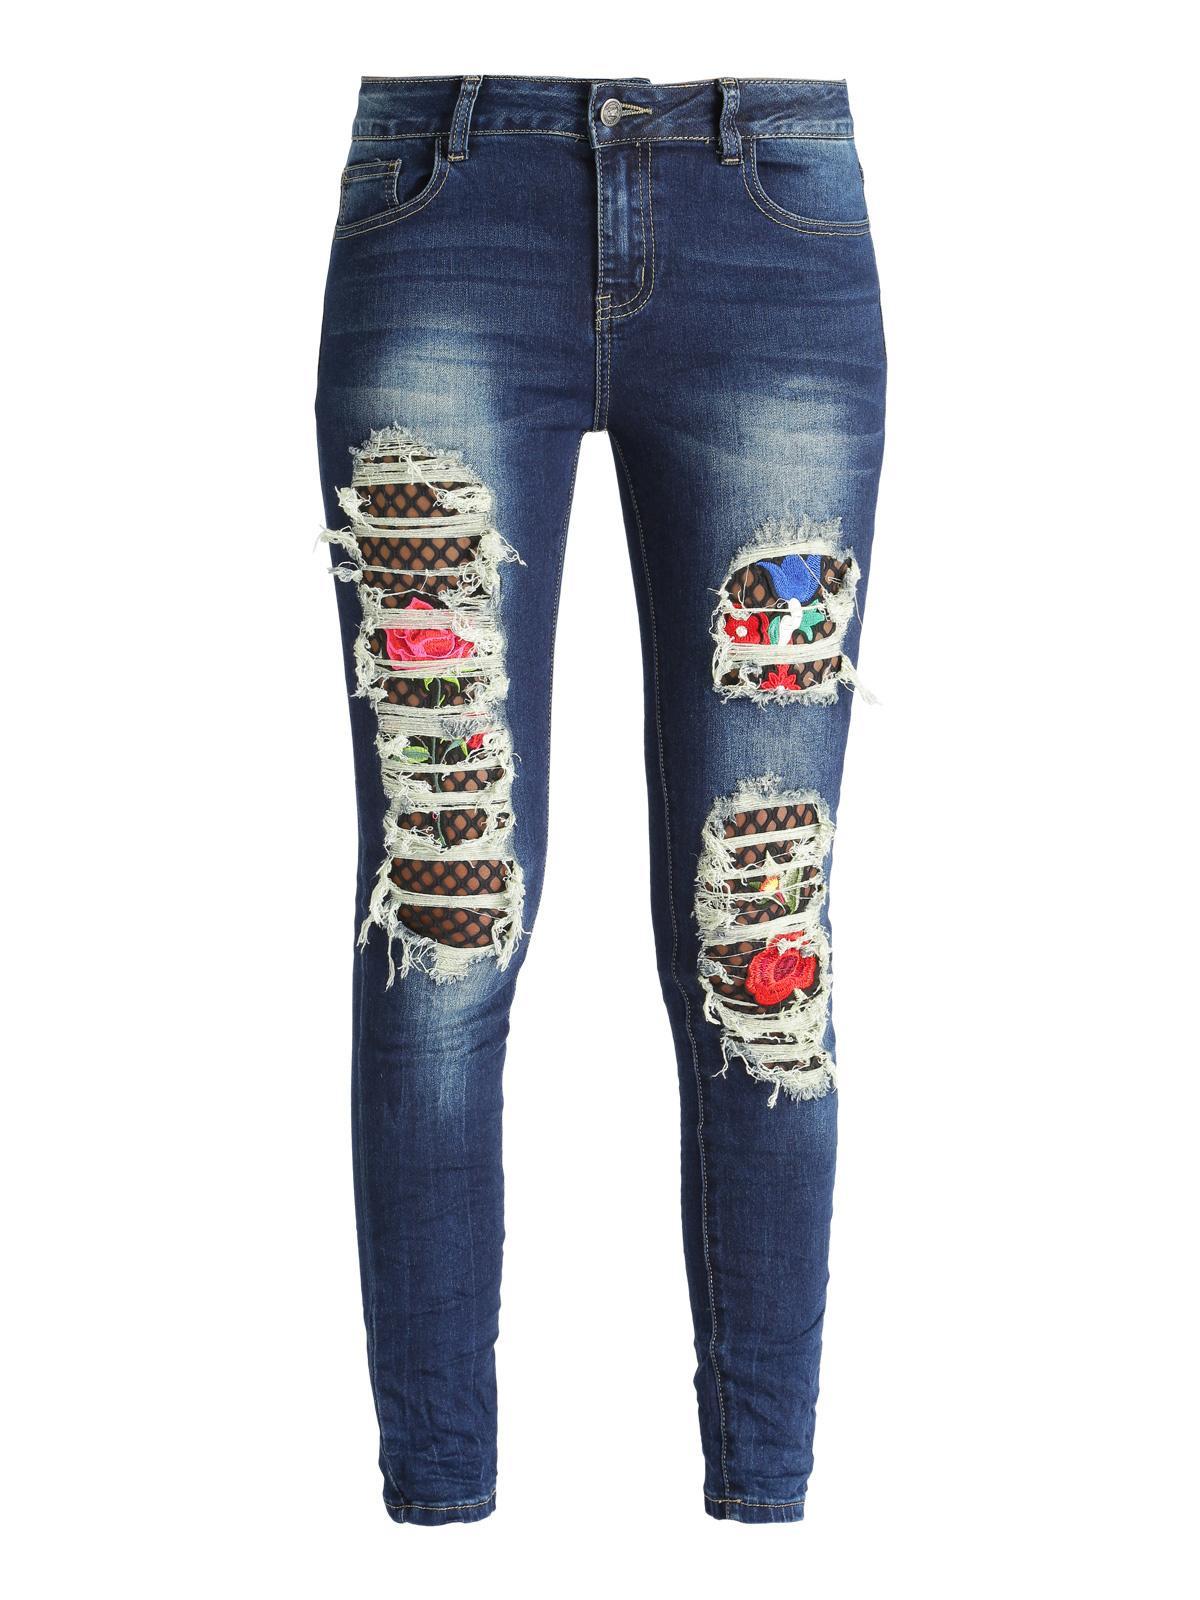 Jeans Rasgados Con Parches Florales En La Red Mujer Mecshopping